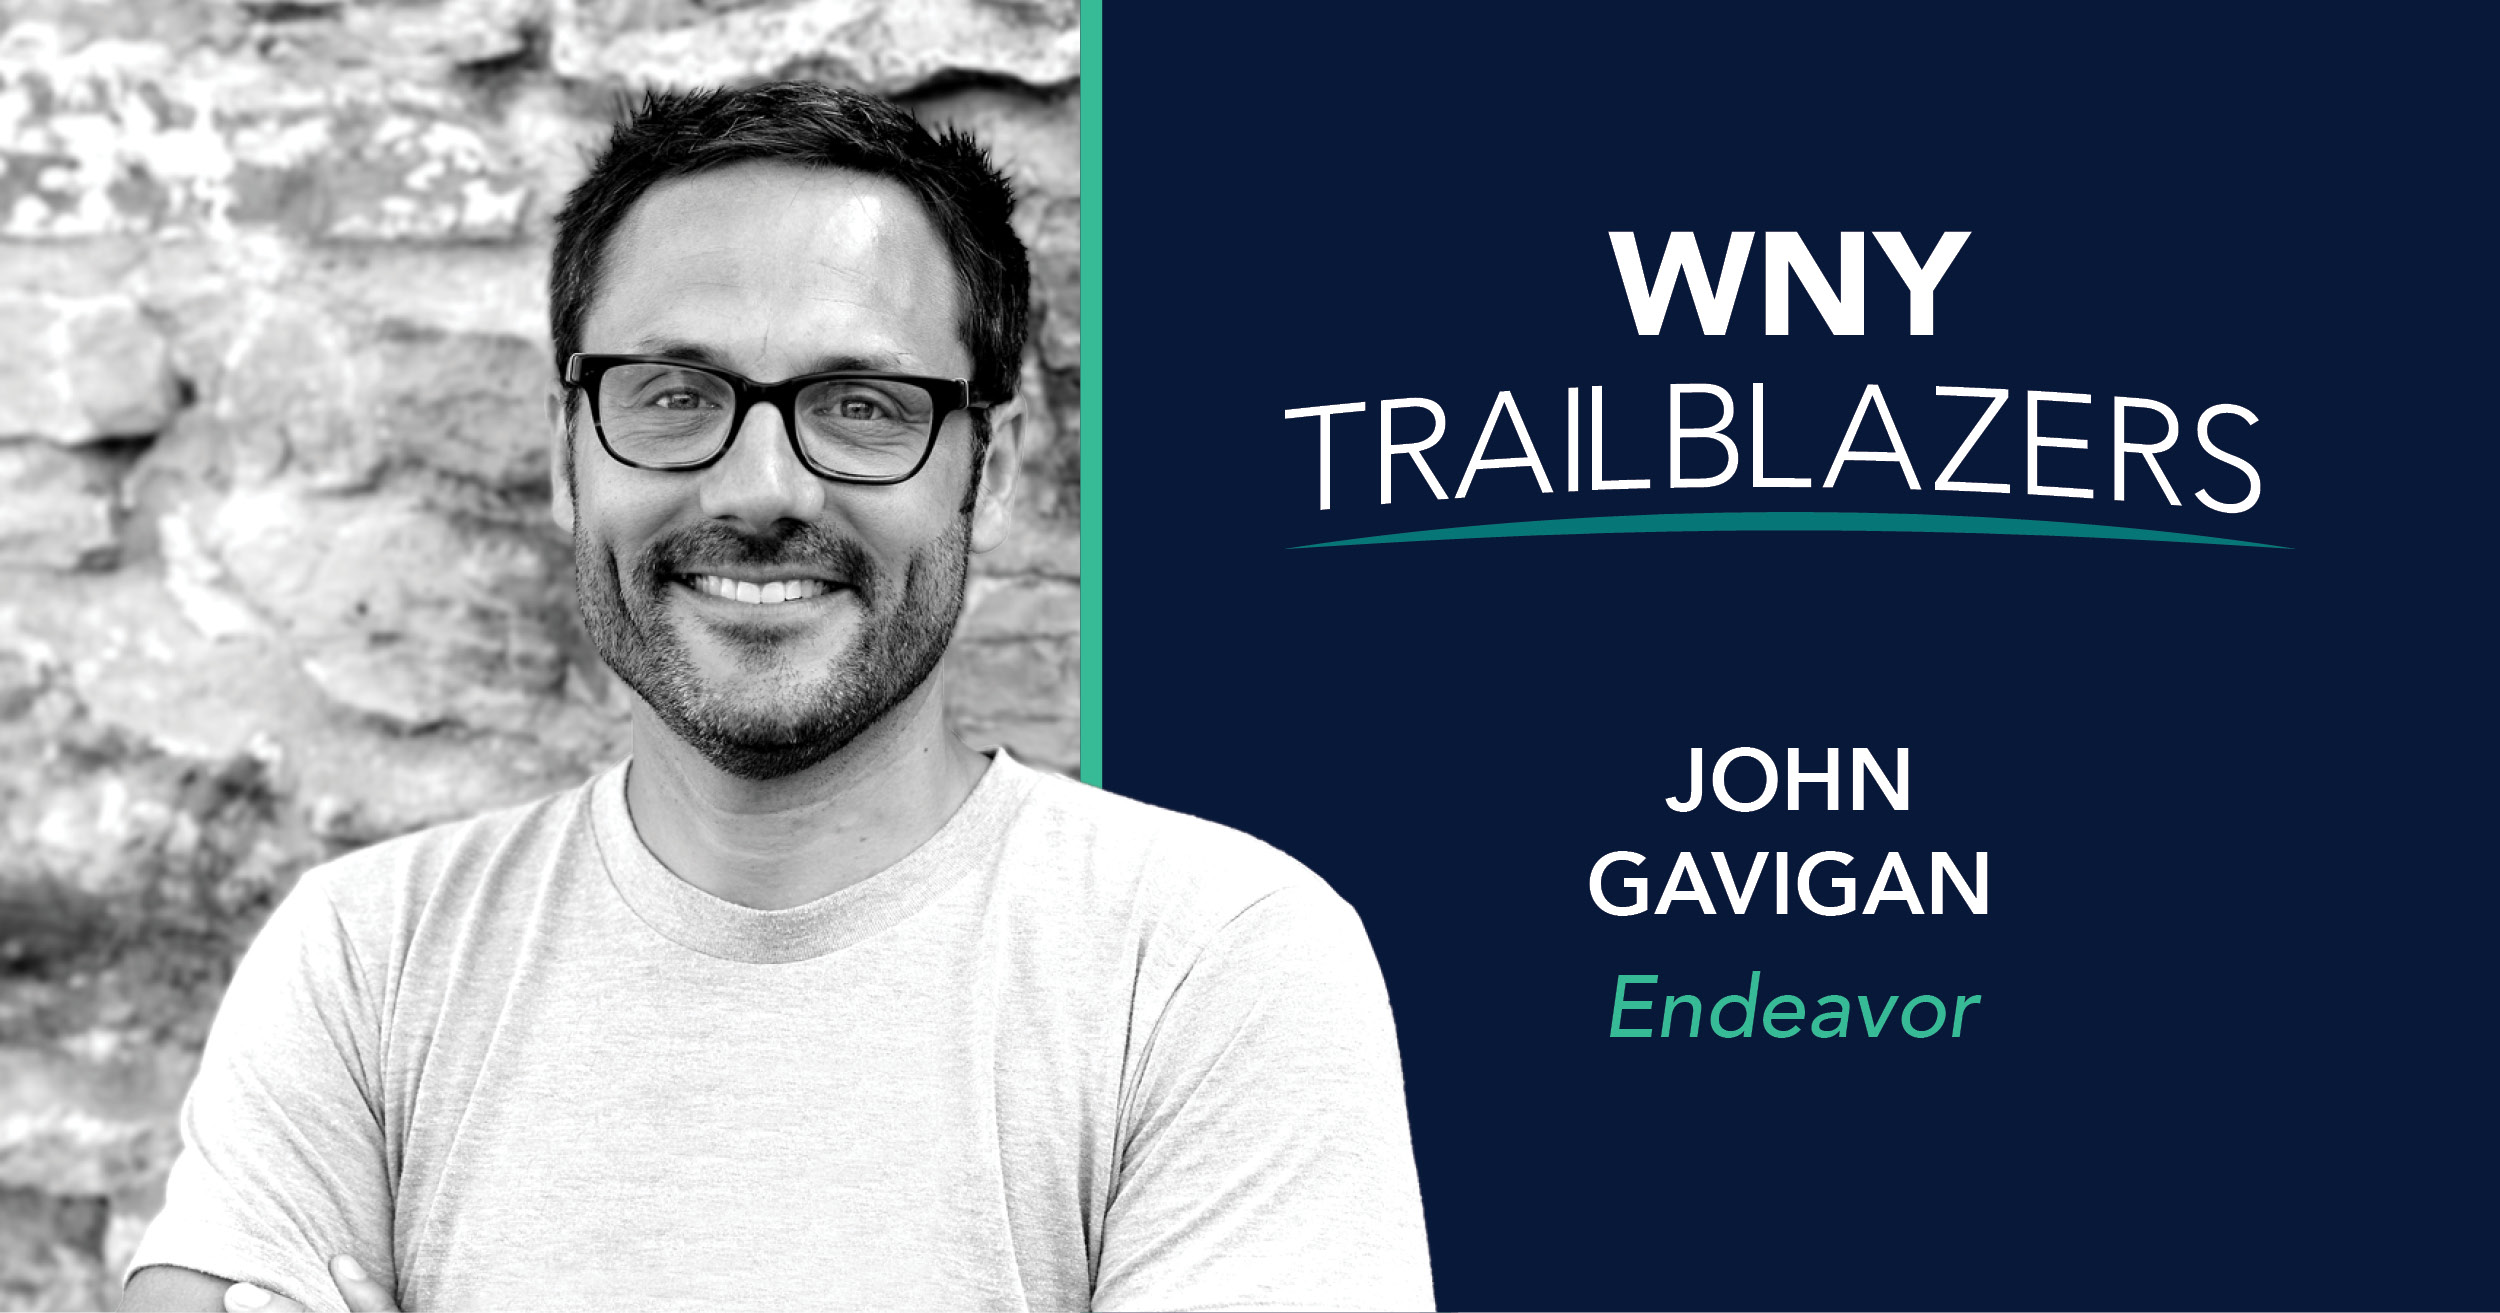 Western New York Trailblazer: John Gavigan, Endeavor